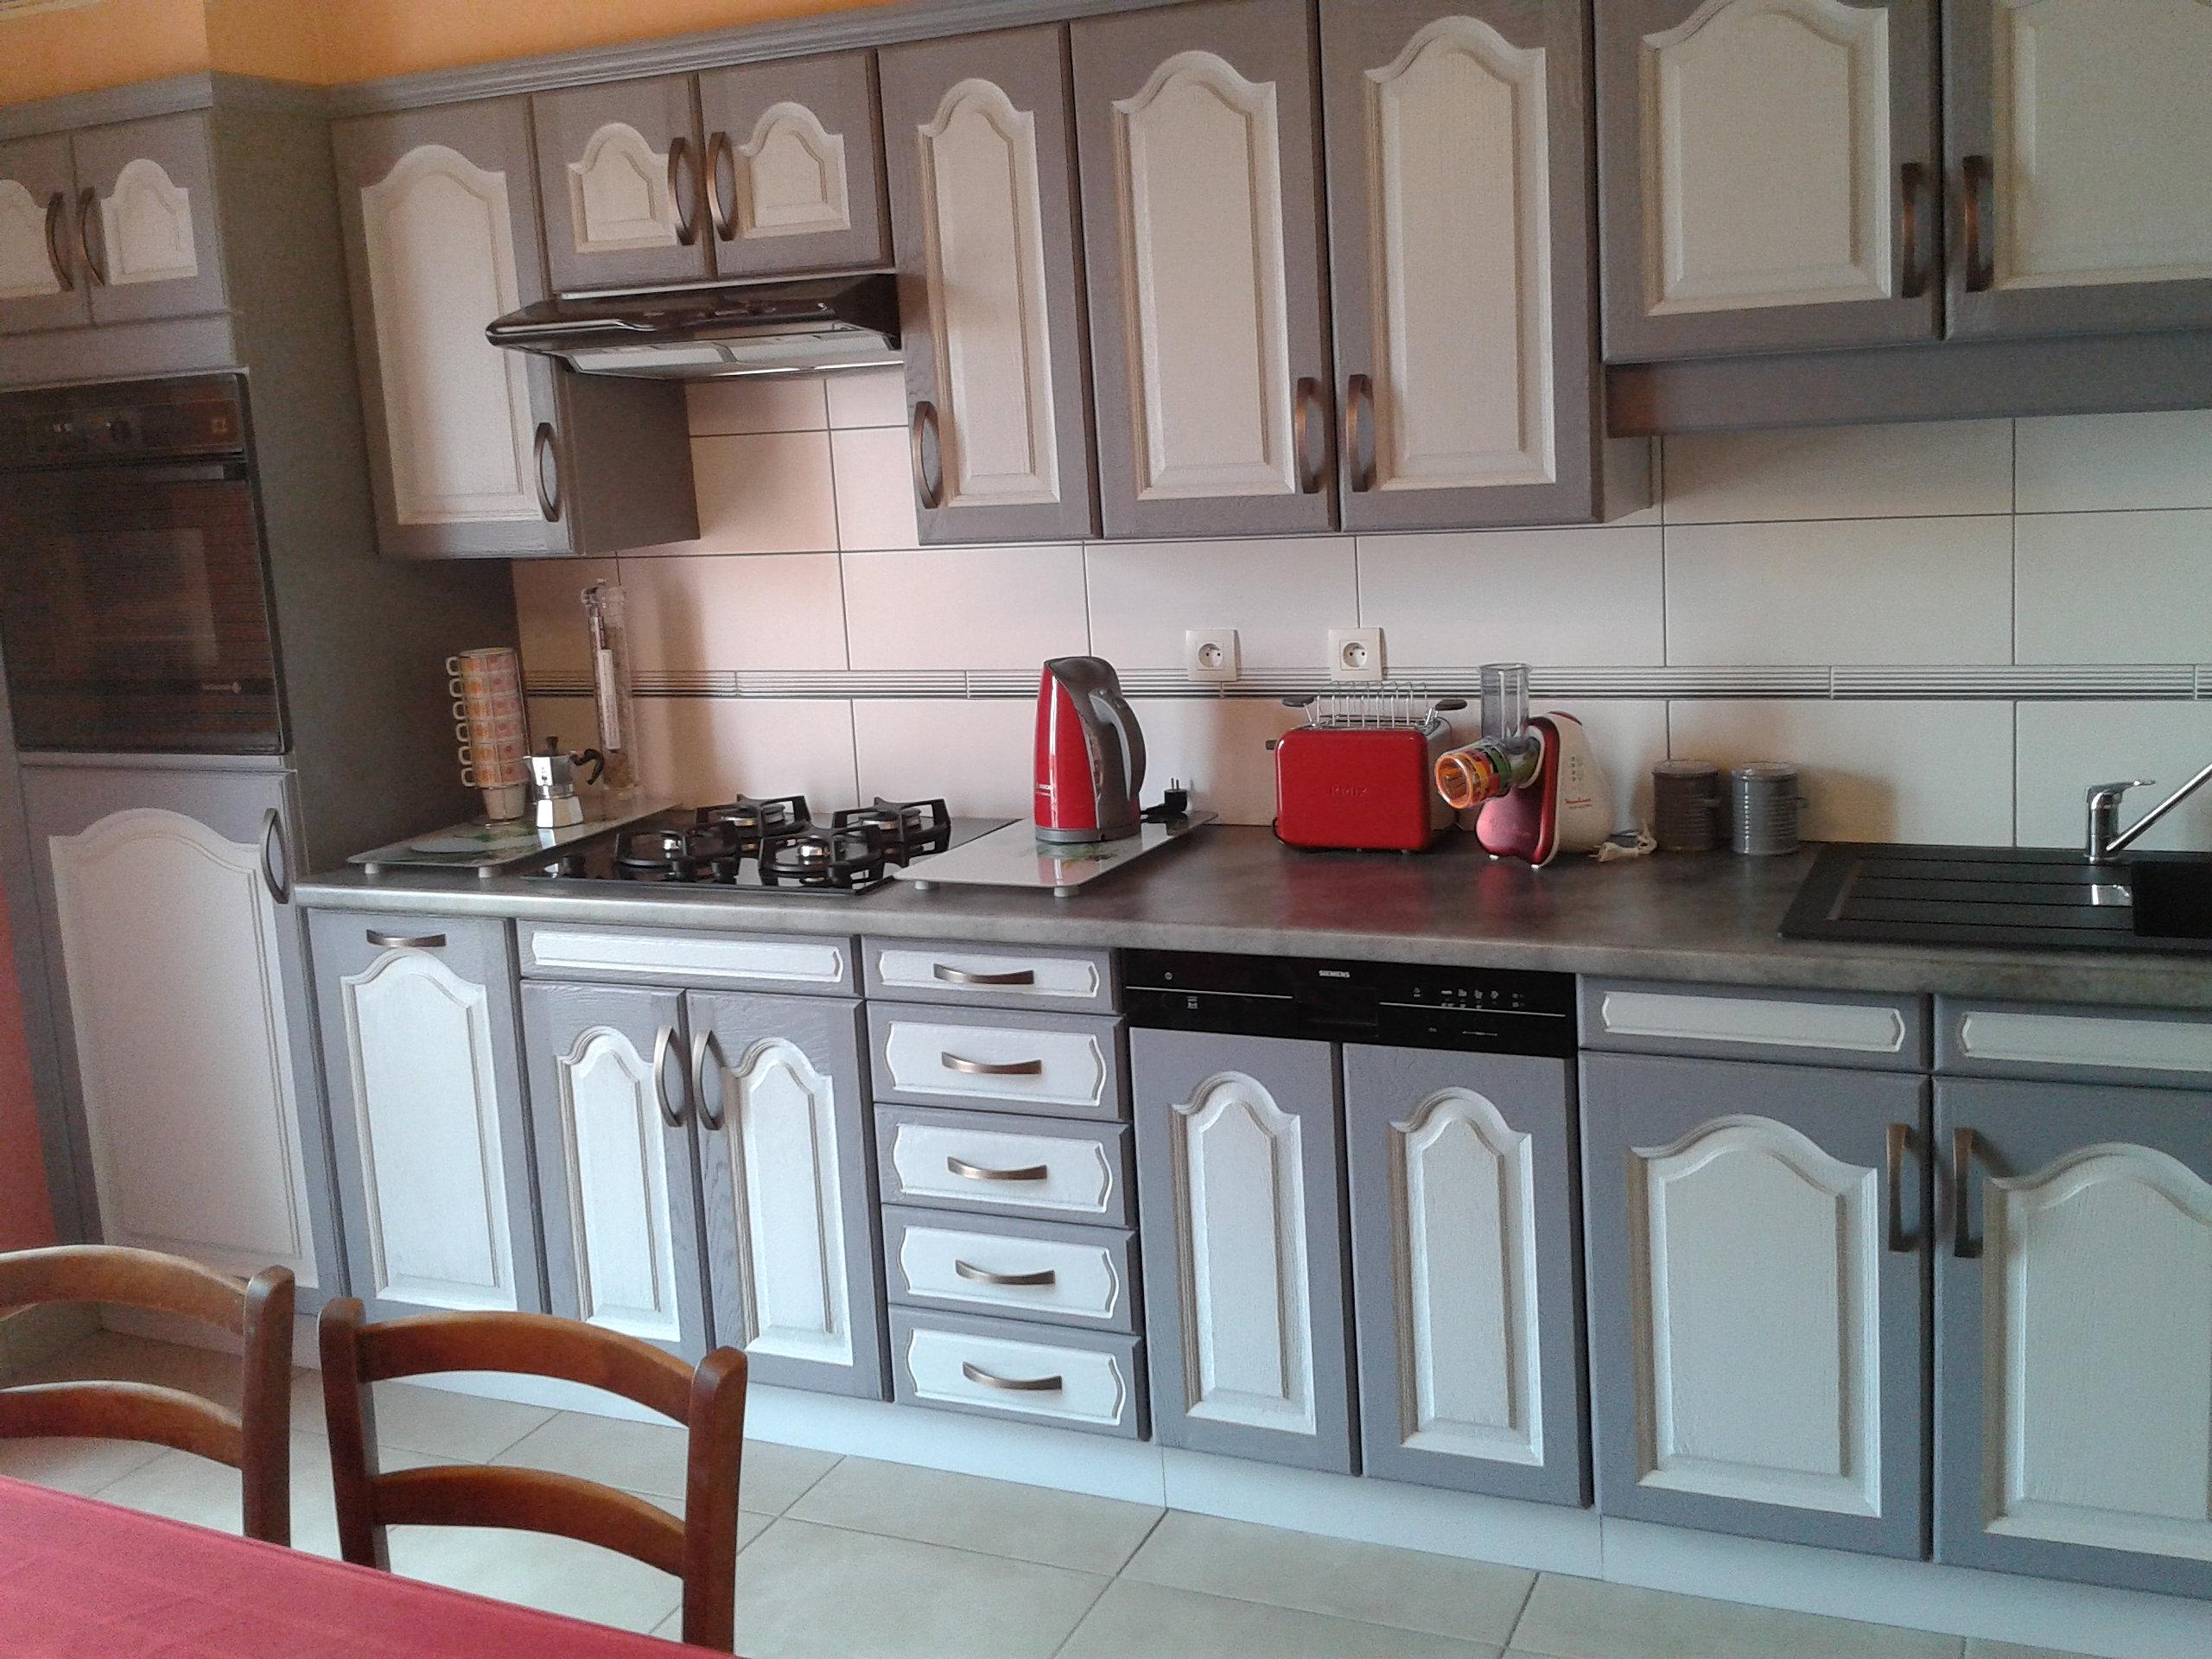 pat a bois quimperle repeindre sa cuisine relooker ses meubles apres. Black Bedroom Furniture Sets. Home Design Ideas